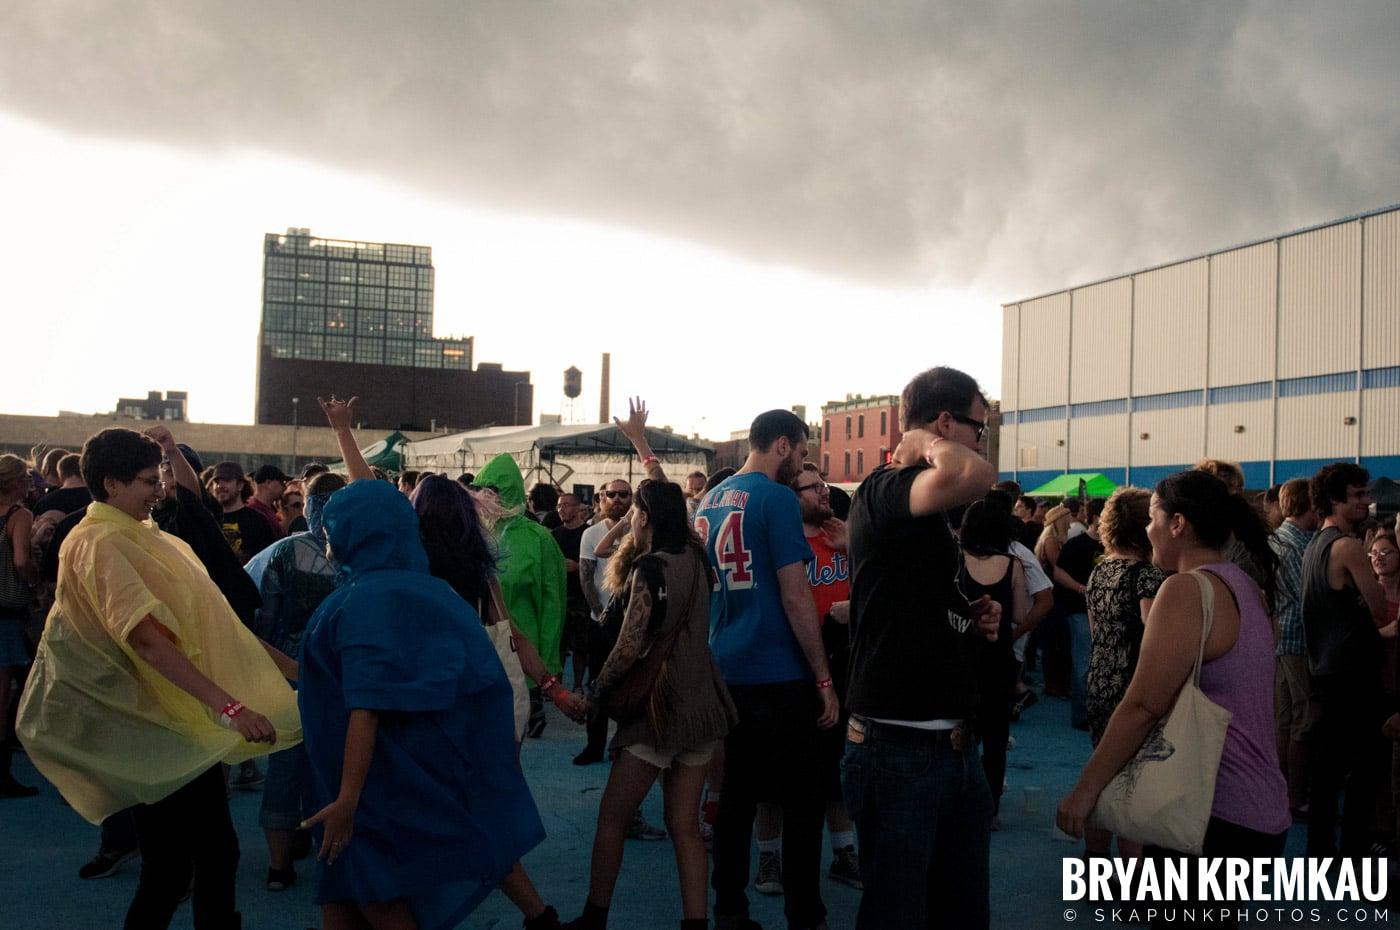 The Bronx @ Riot Fest 2012, Williamsburg Park NY - 9.8.12 (3)